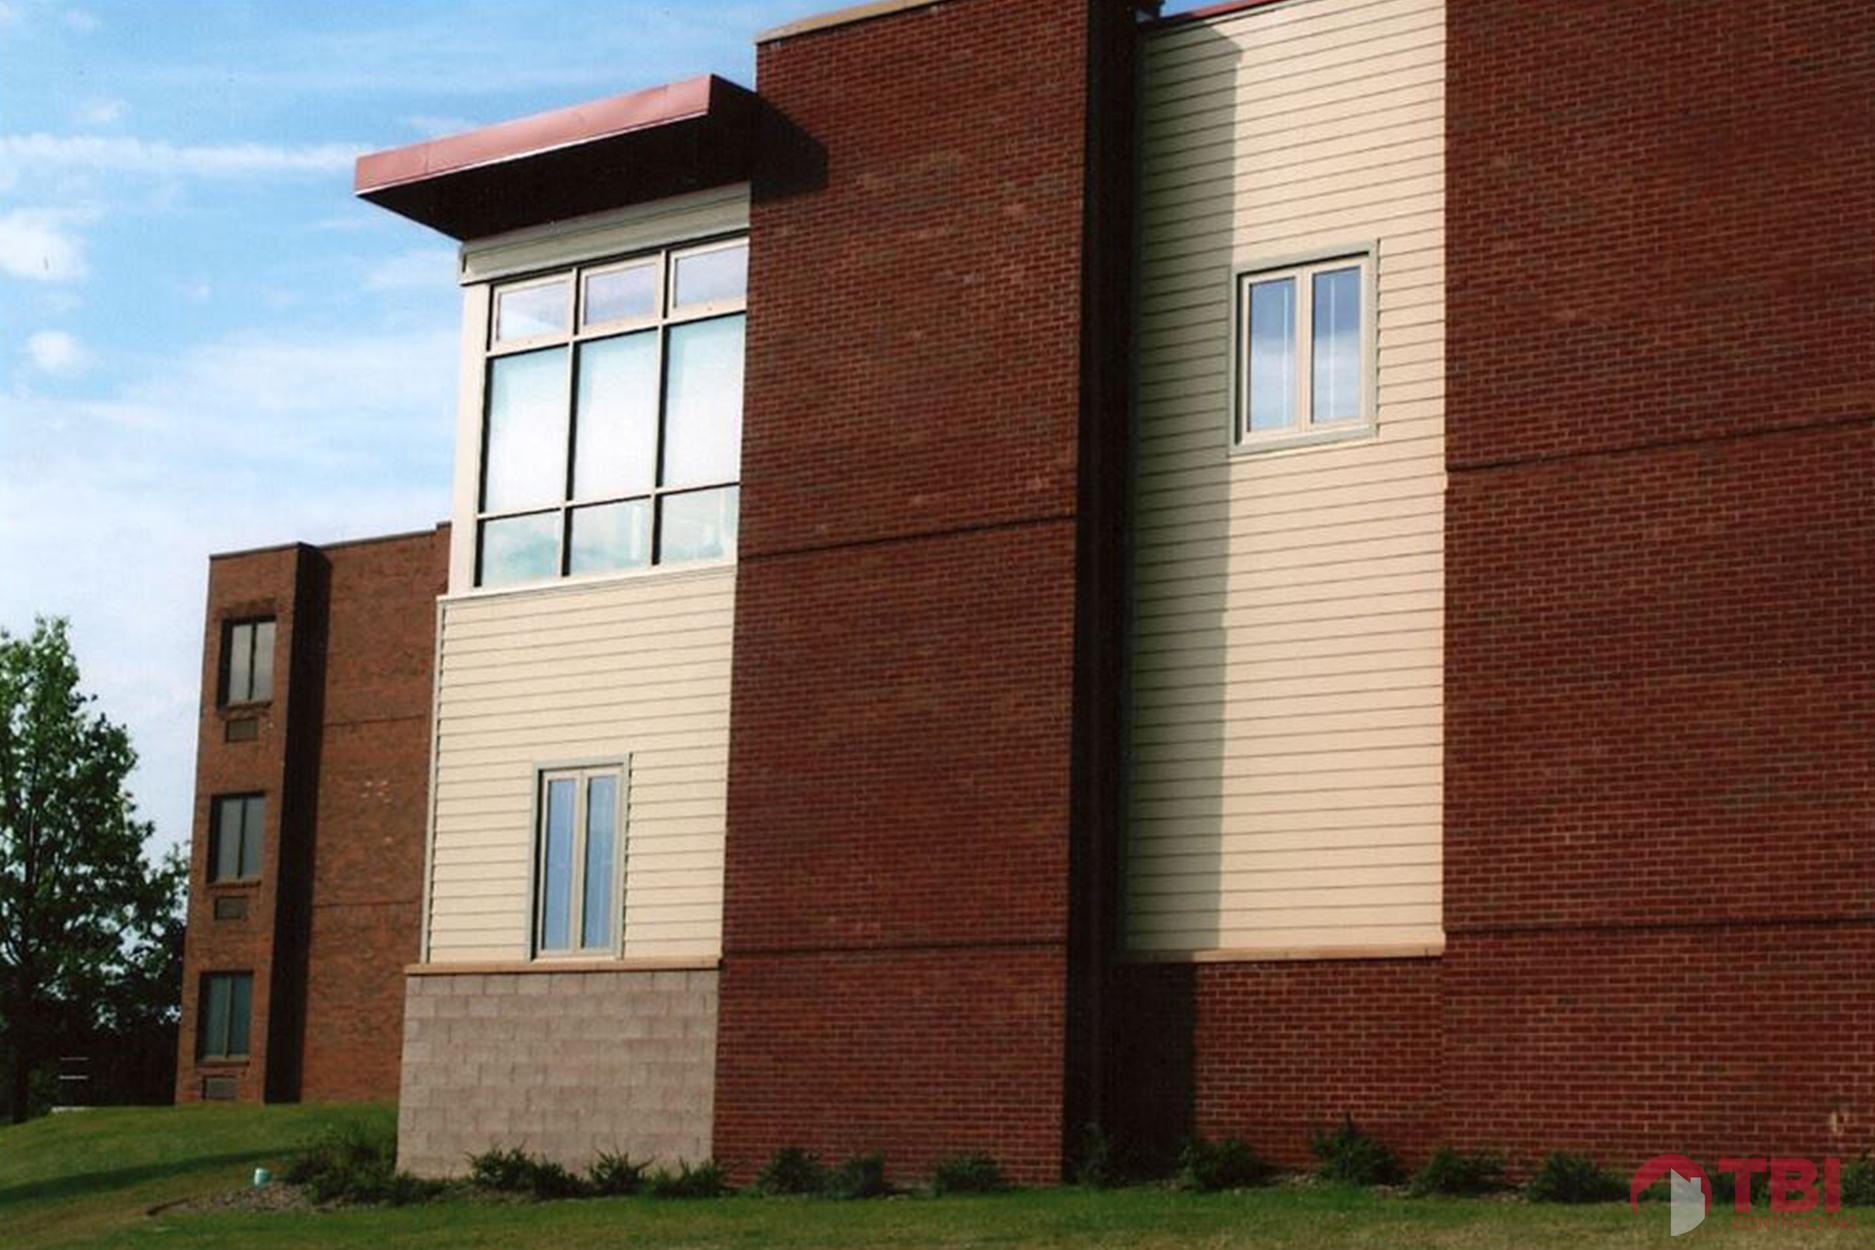 https://tbicontracting.com/wp-content/uploads/2015/05/washington-county-health-center-1.jpg